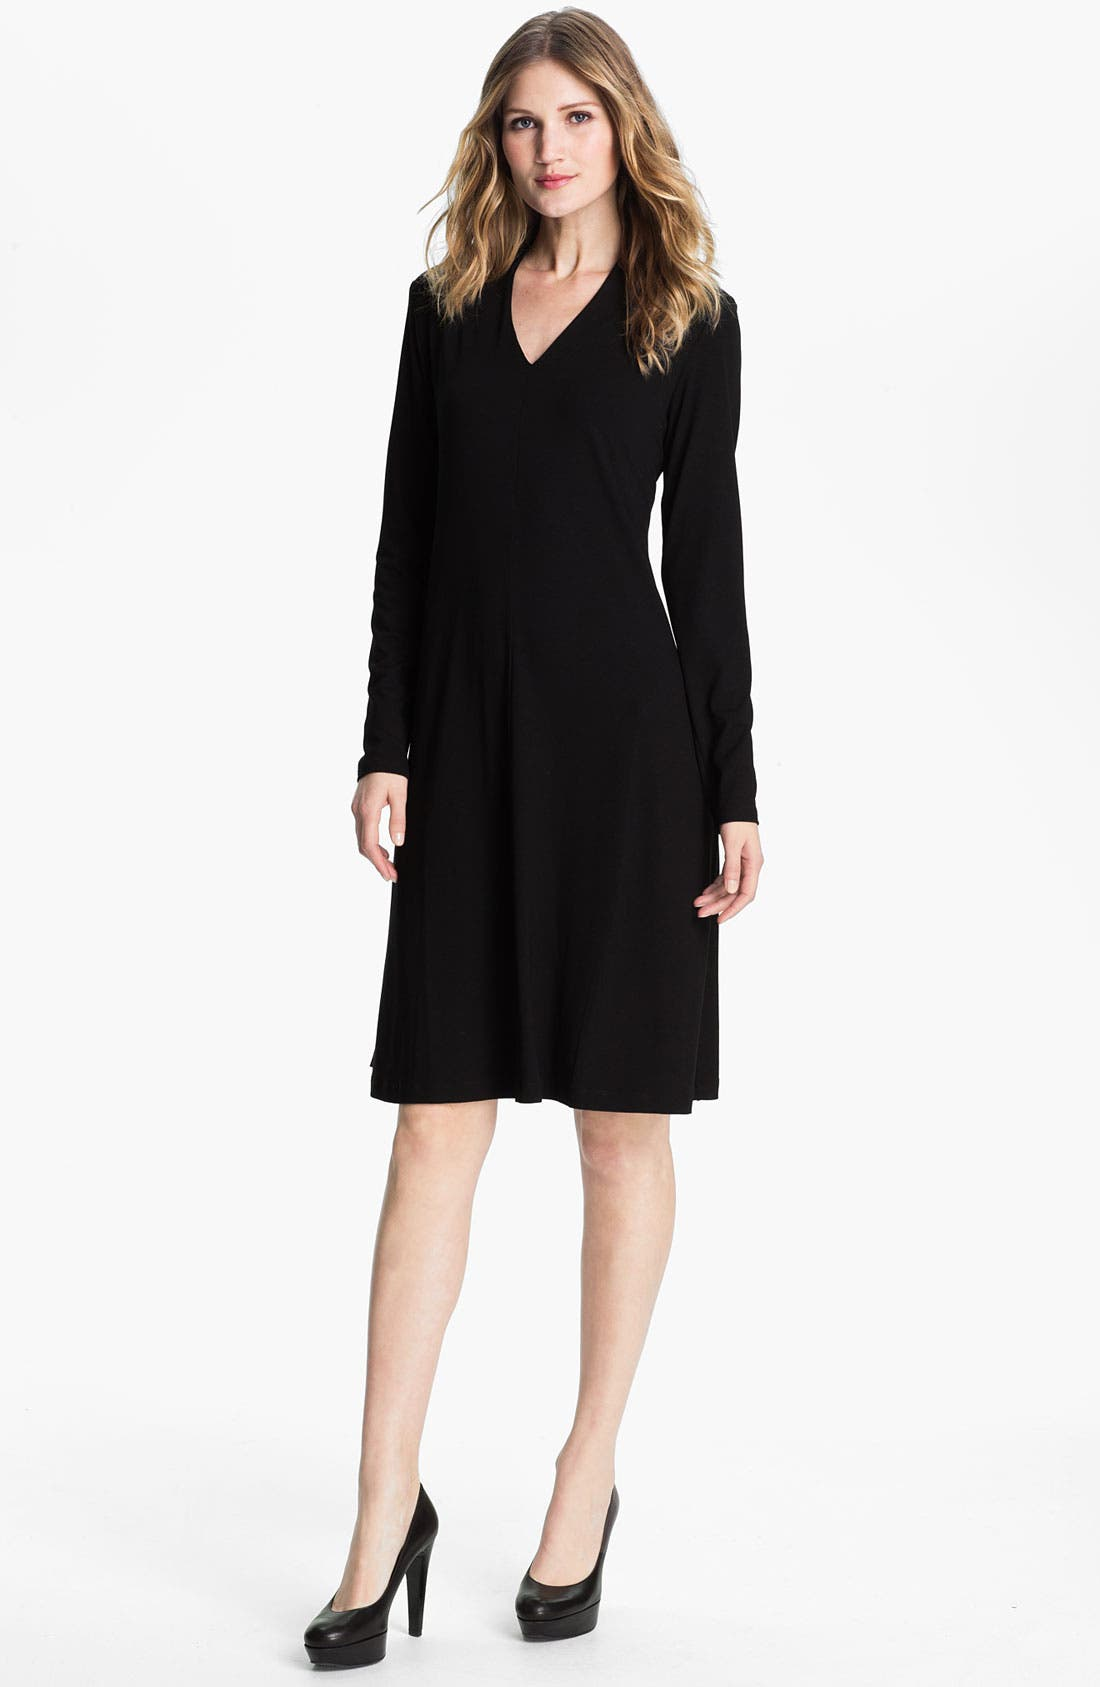 Alternate Image 1 Selected - Eileen Fisher V-Neck Dress (Online Exclusive)